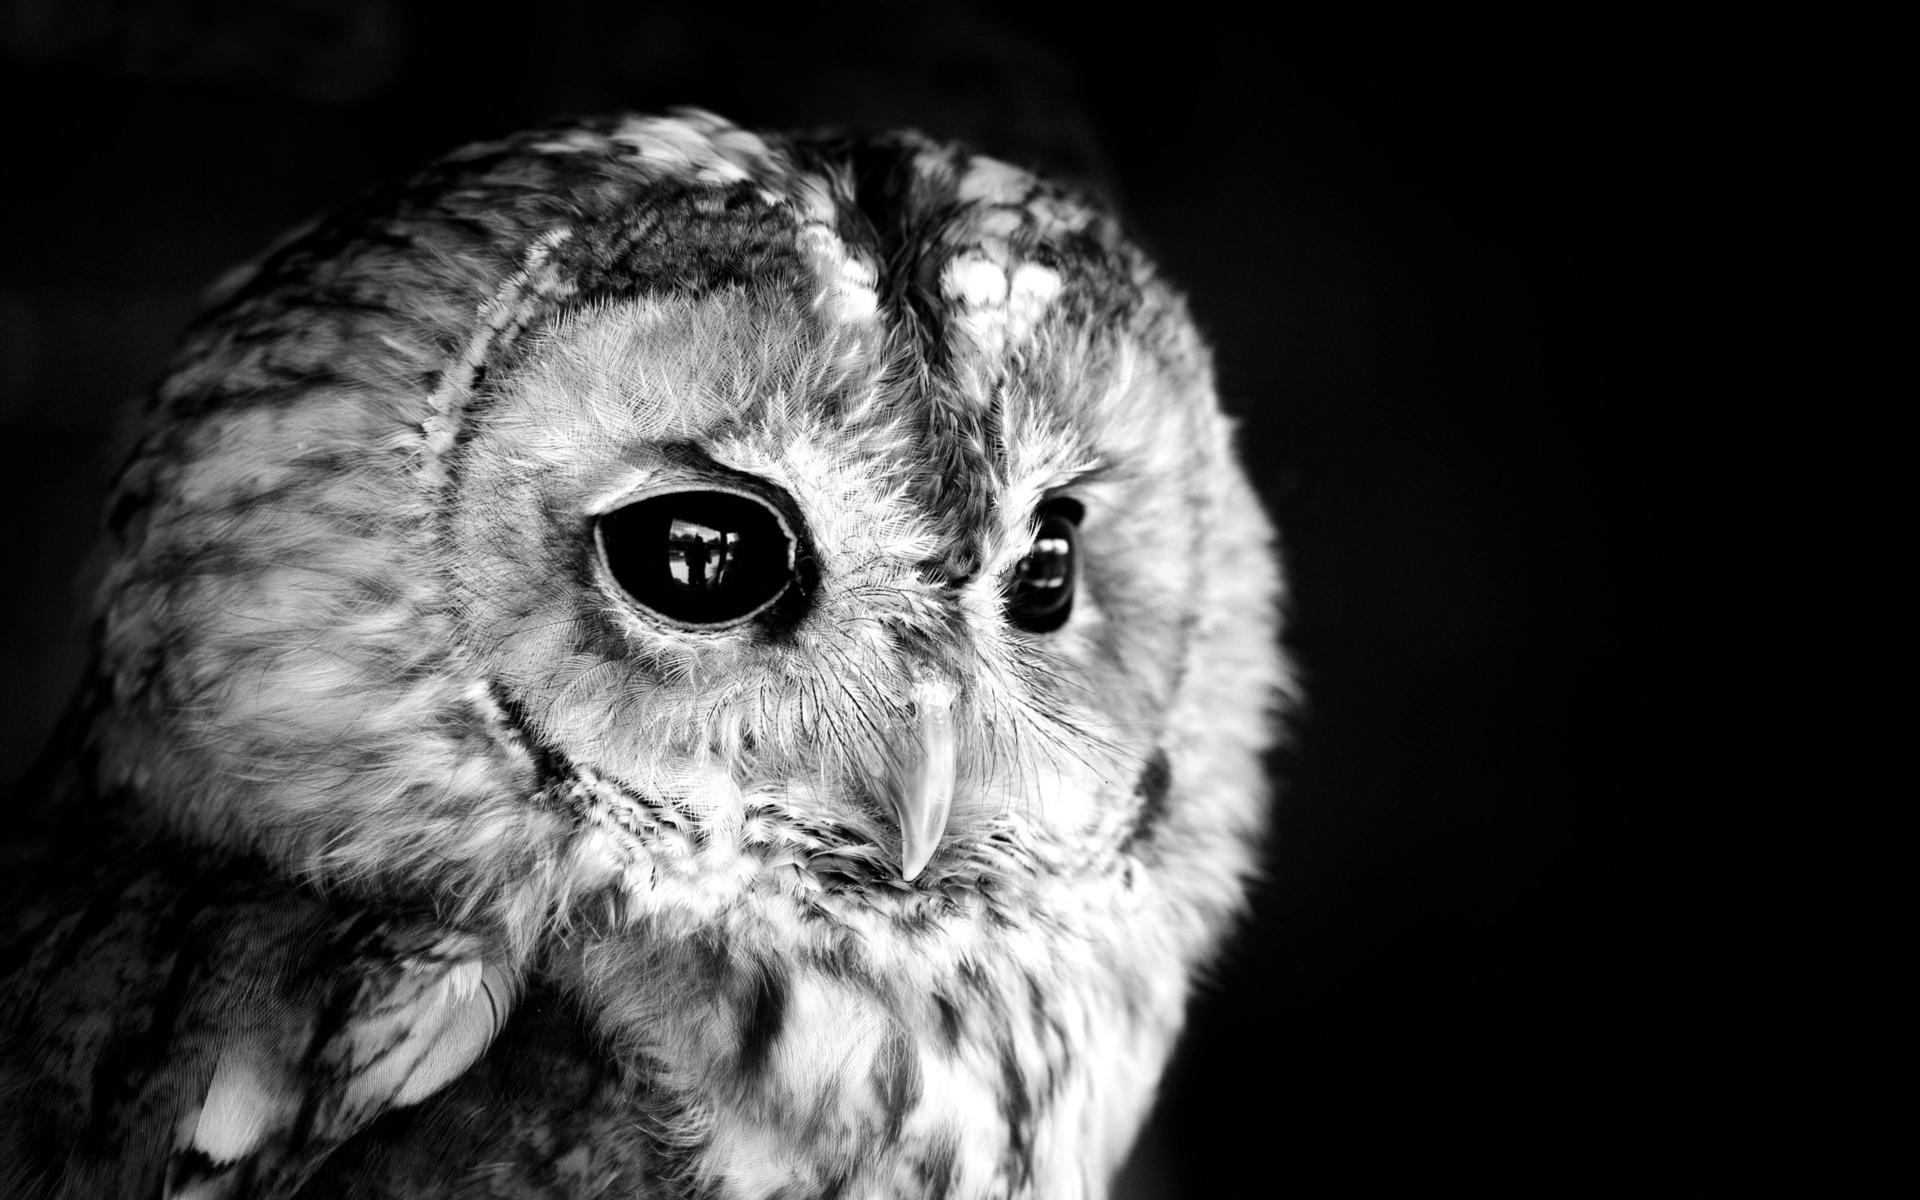 Black owl photo white monochrome face eyes feathers ...